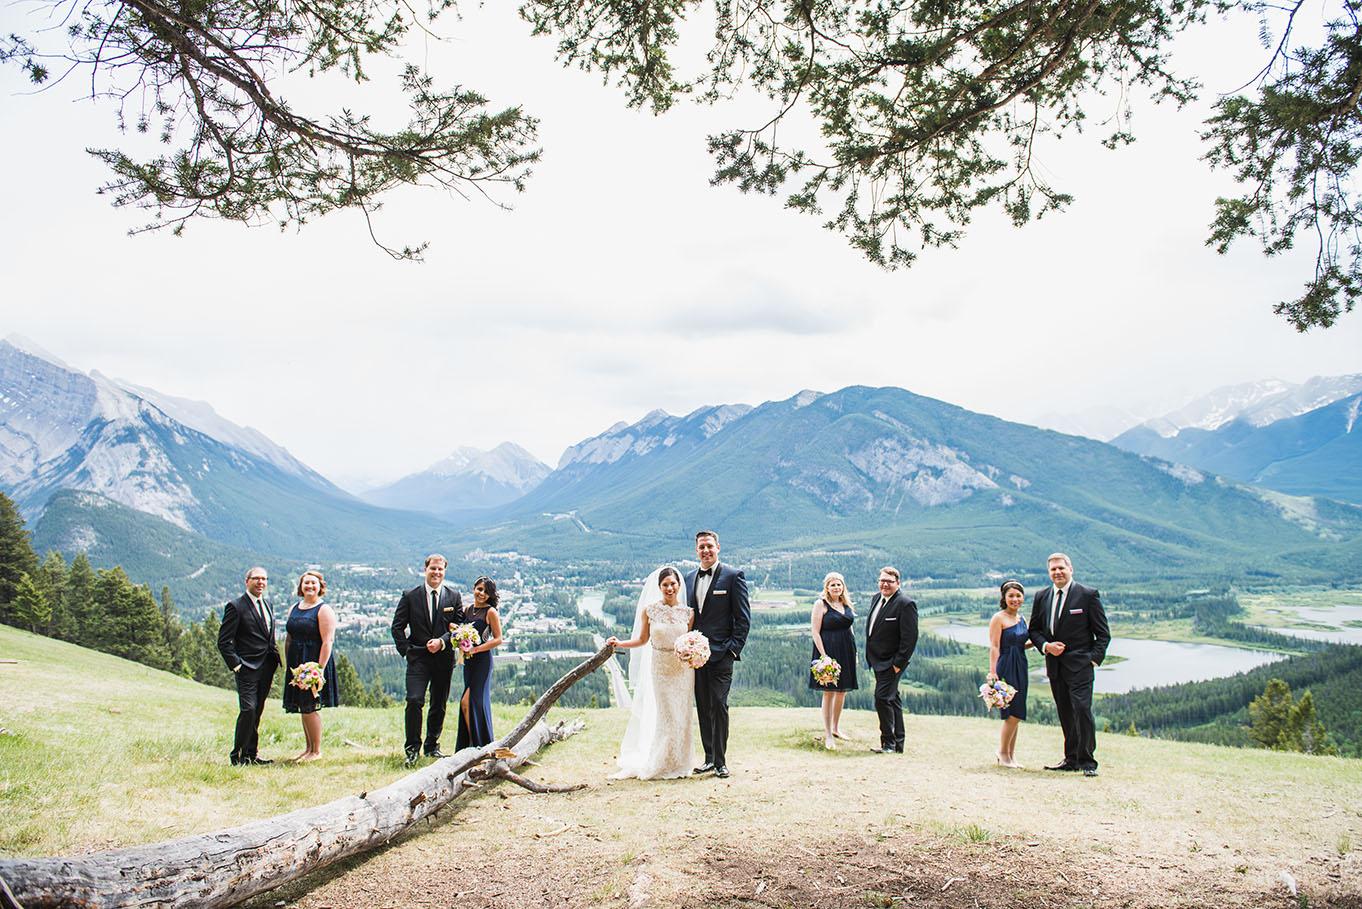 Banff Canmore Lake Louise Calgary Rocky Mountain Wedding: Banff Wedding Rimrock SD Party · Calgary Wedding Planners